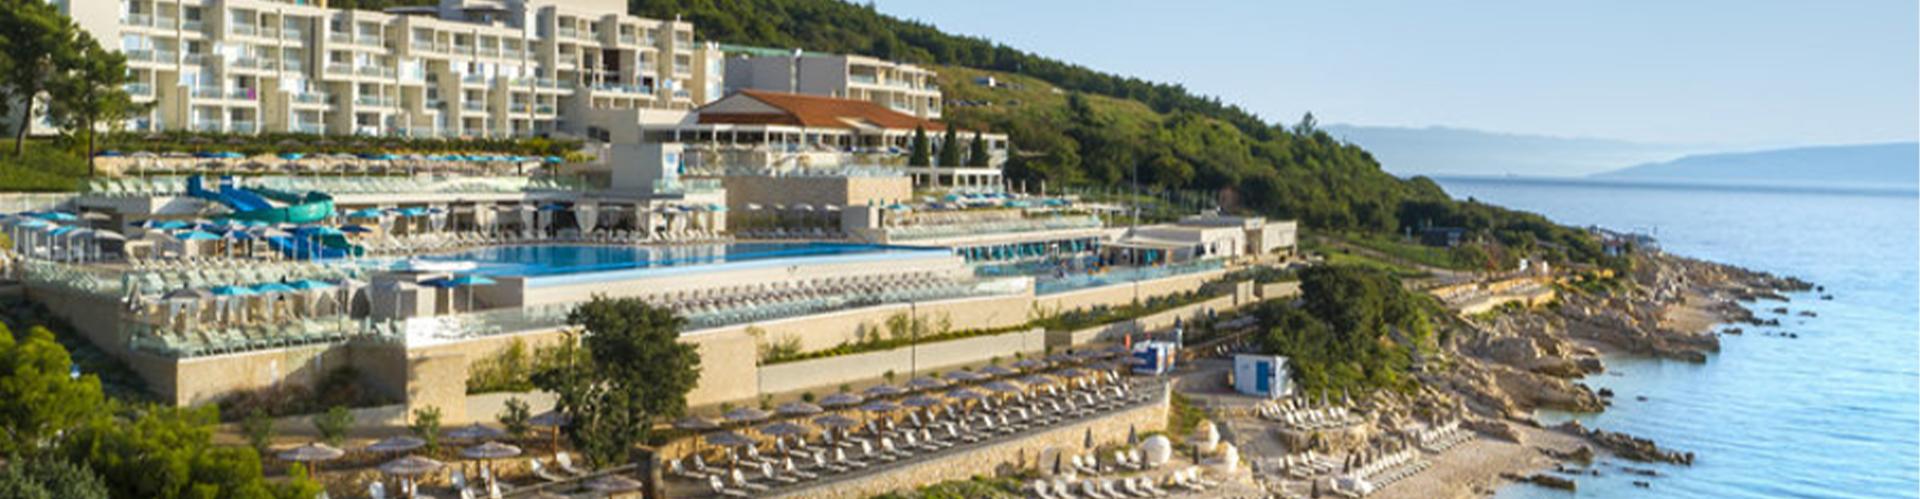 urlaub-2020-buchen-kroatien-reise-reiseburo-rosenheim-reisebuero-raubling-kolbermoor-wagner-reisen-1-breit